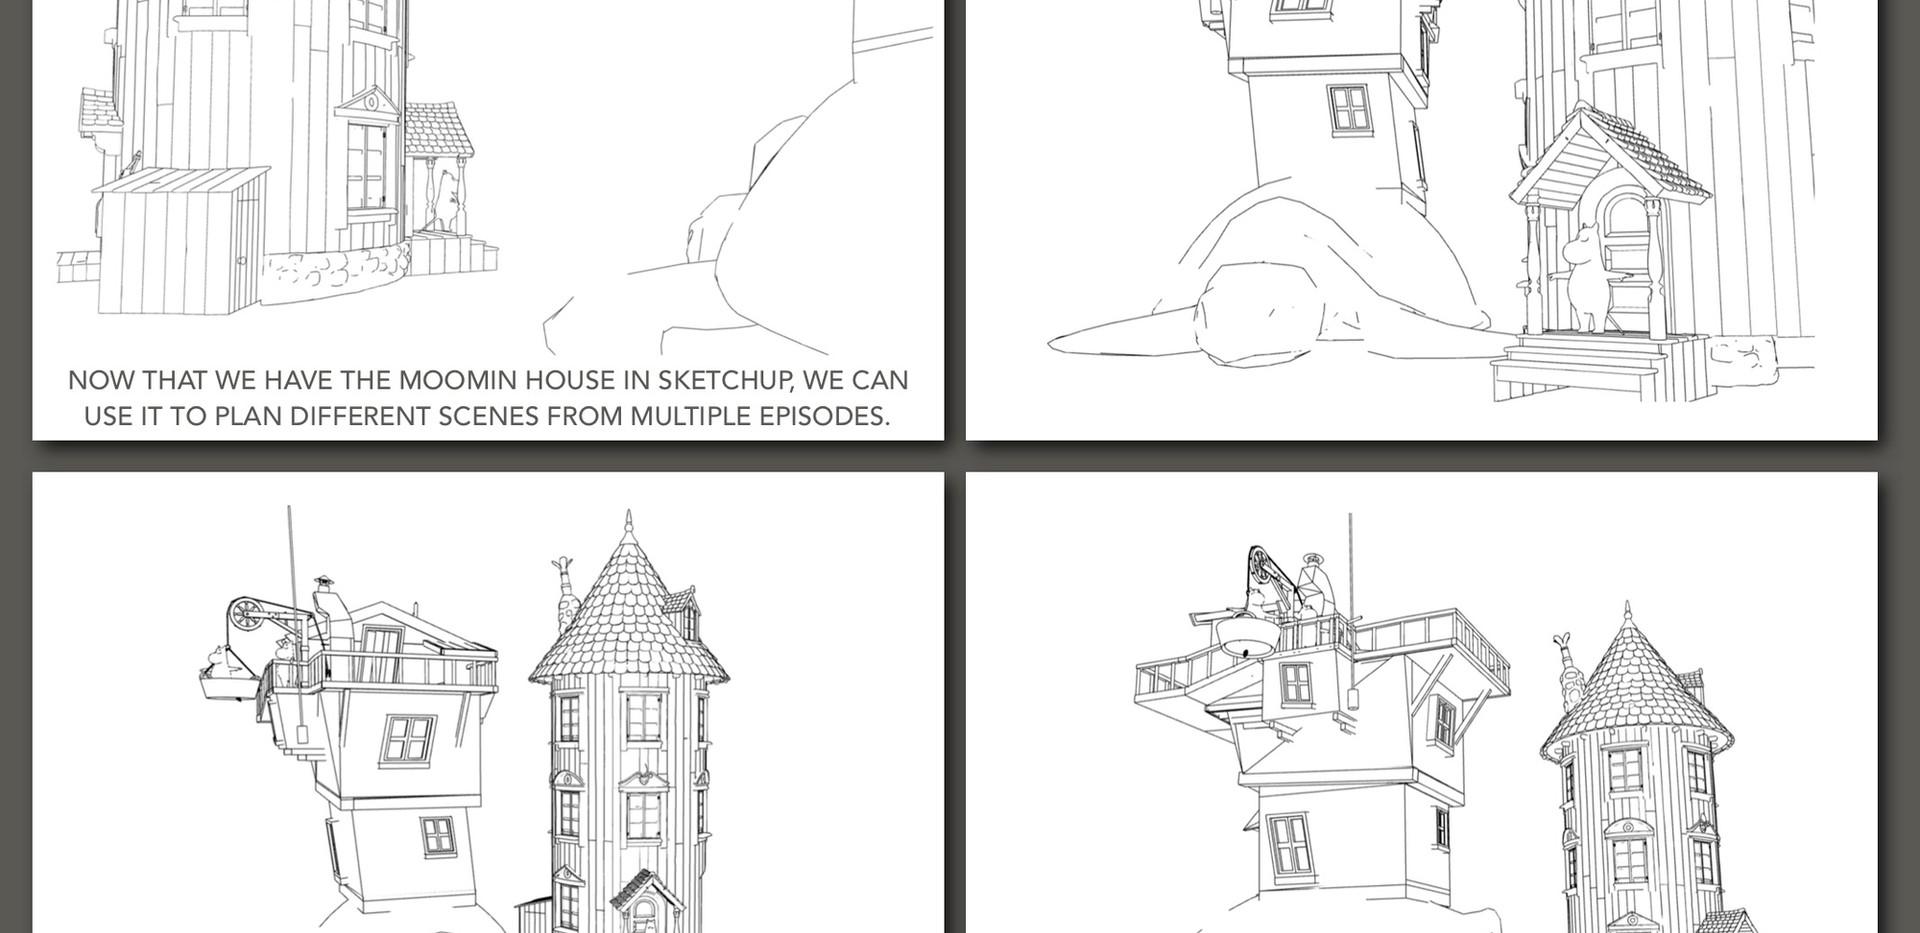 3D development using Sketchup